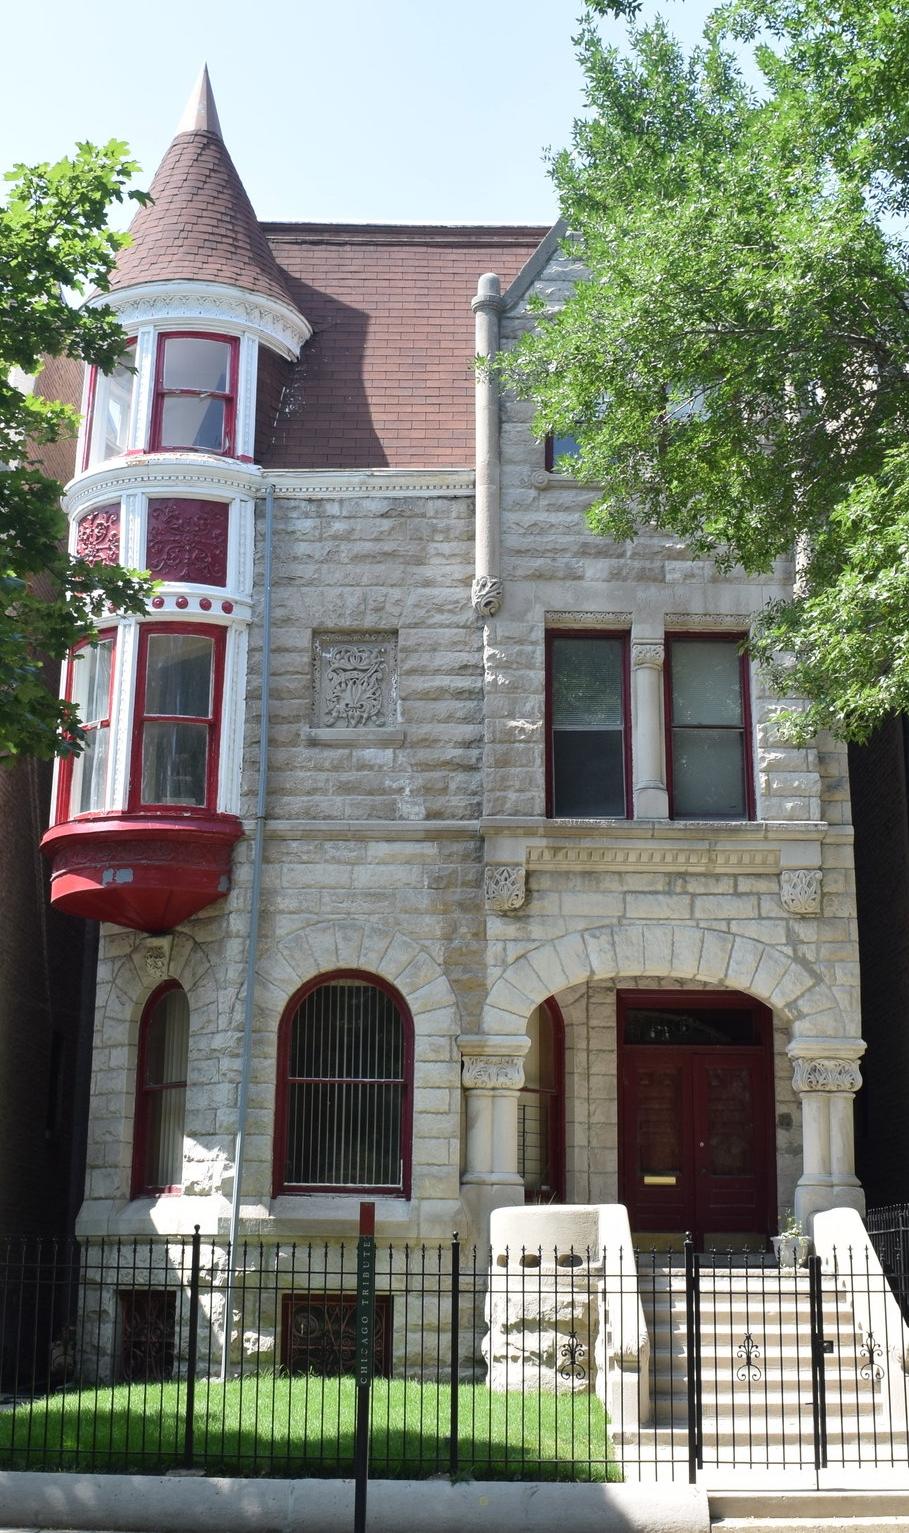 Ida B. Wells-Barnett House